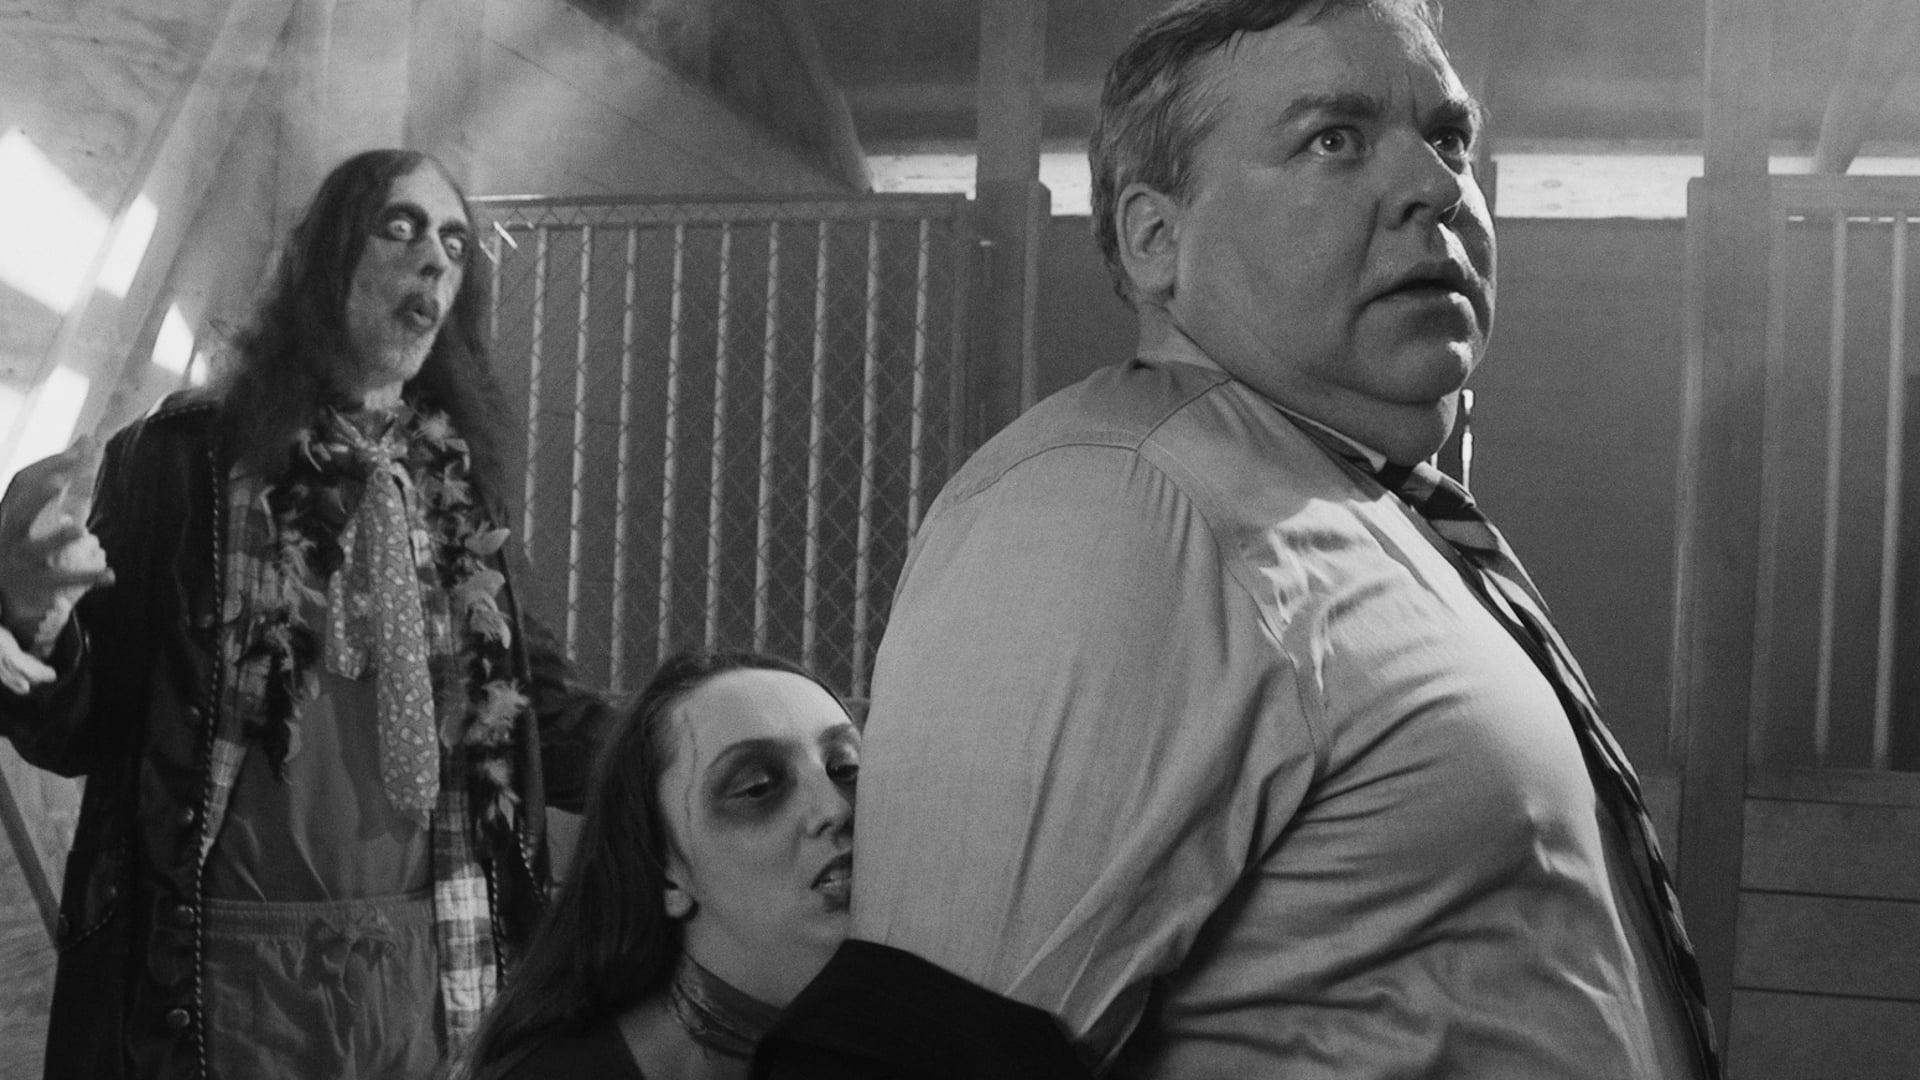 The Big Sale - Short Zombie Film